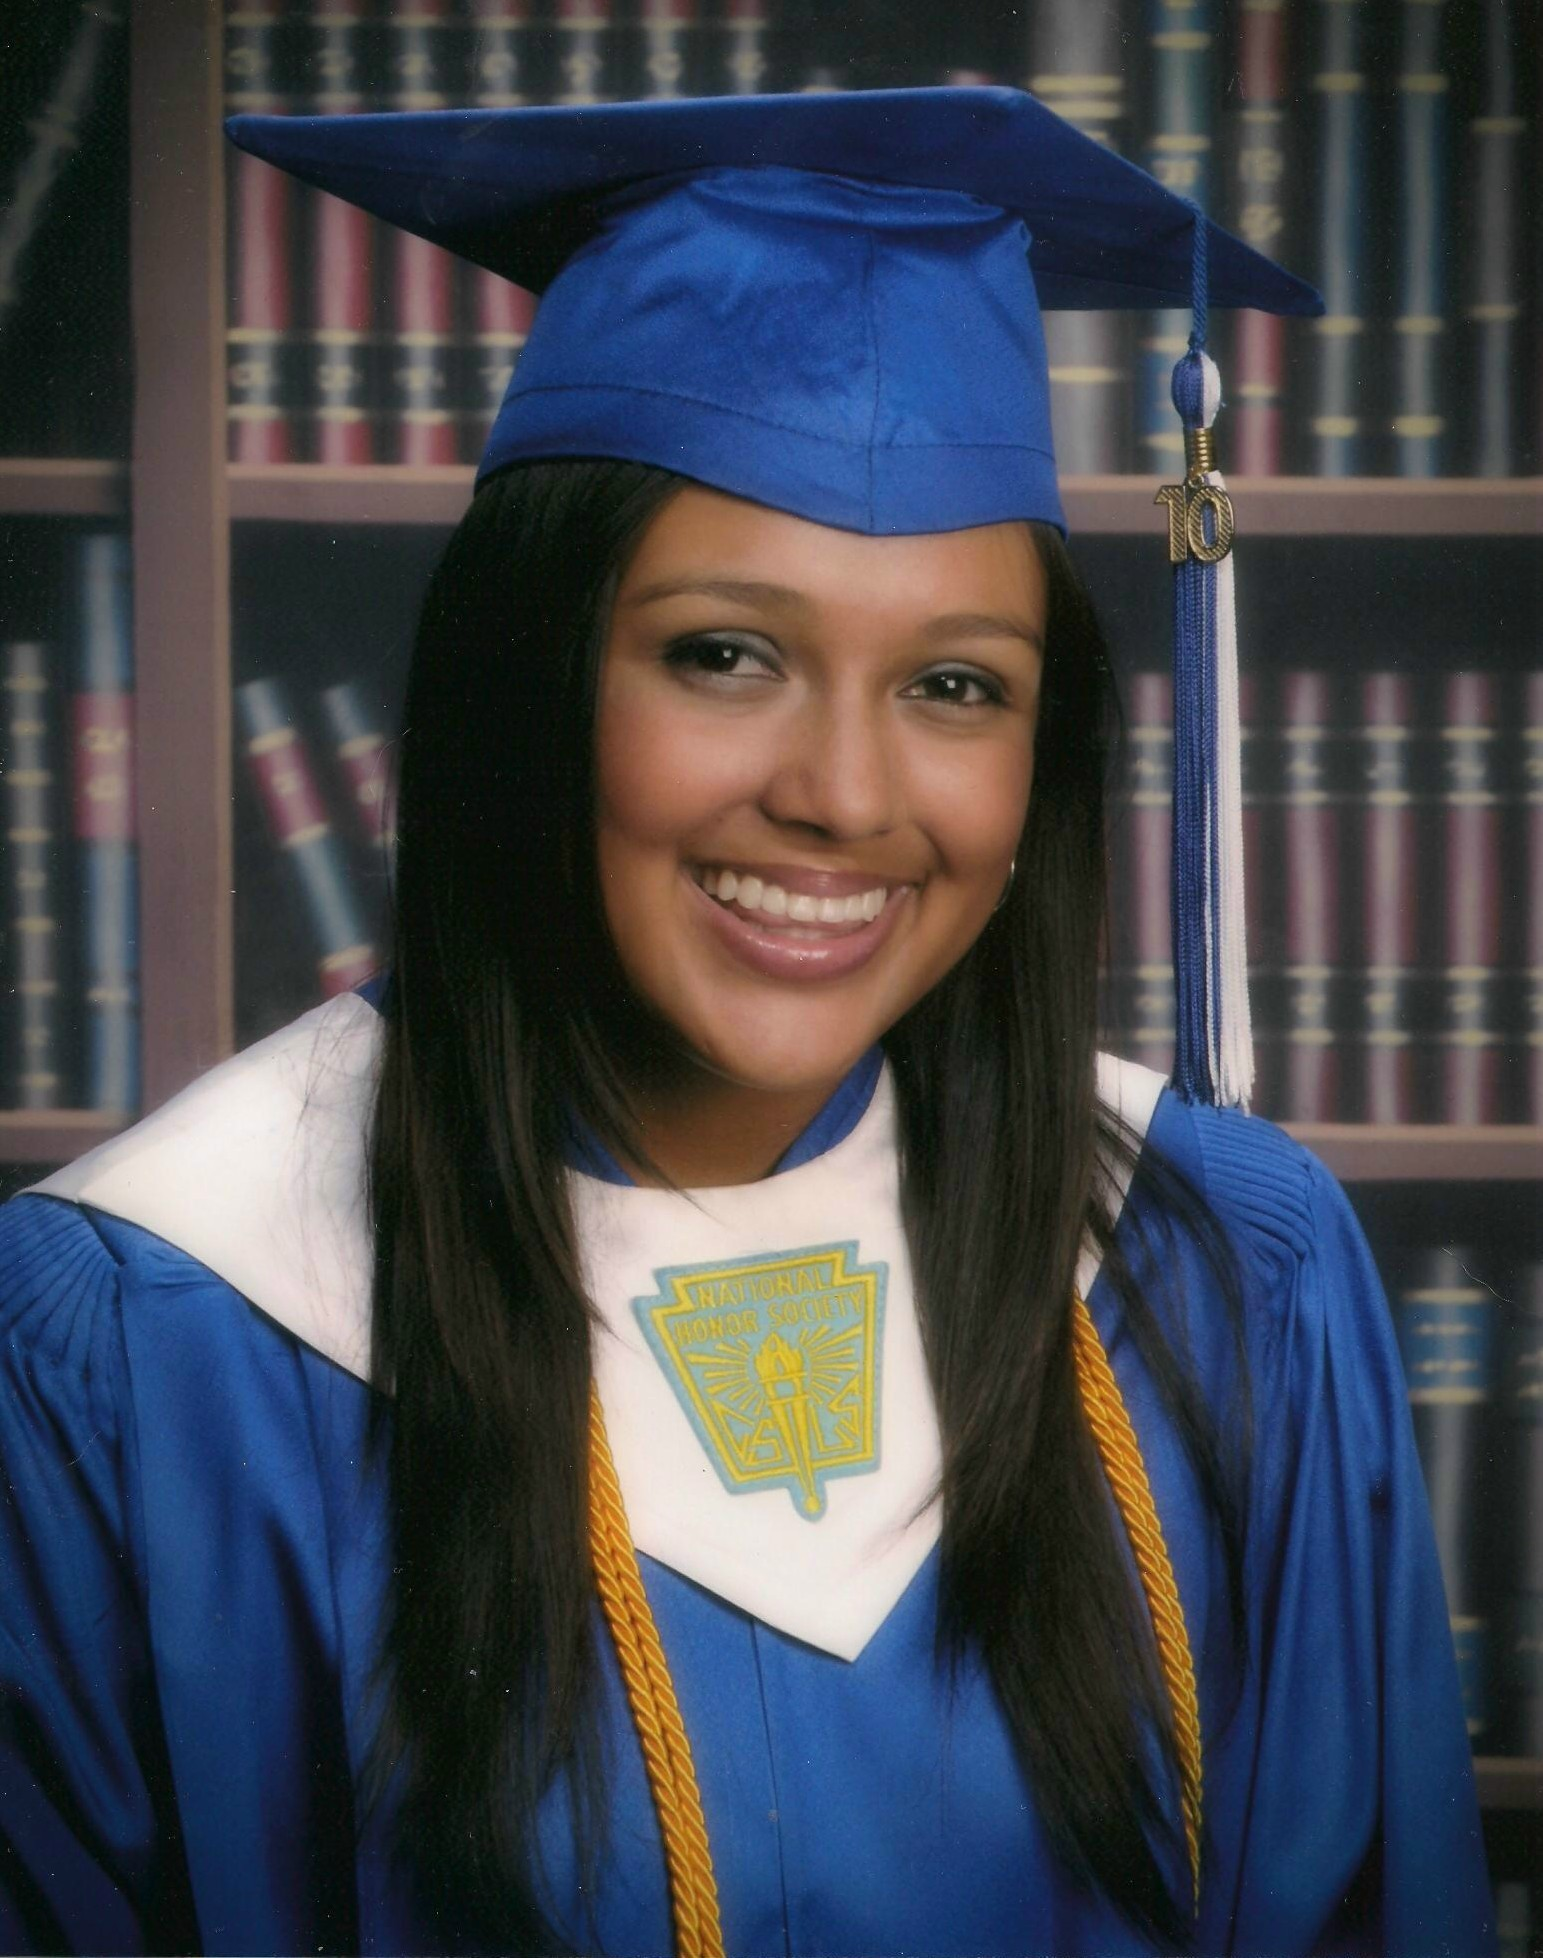 Jennifer - 2010 attended The University of Texas at Austin